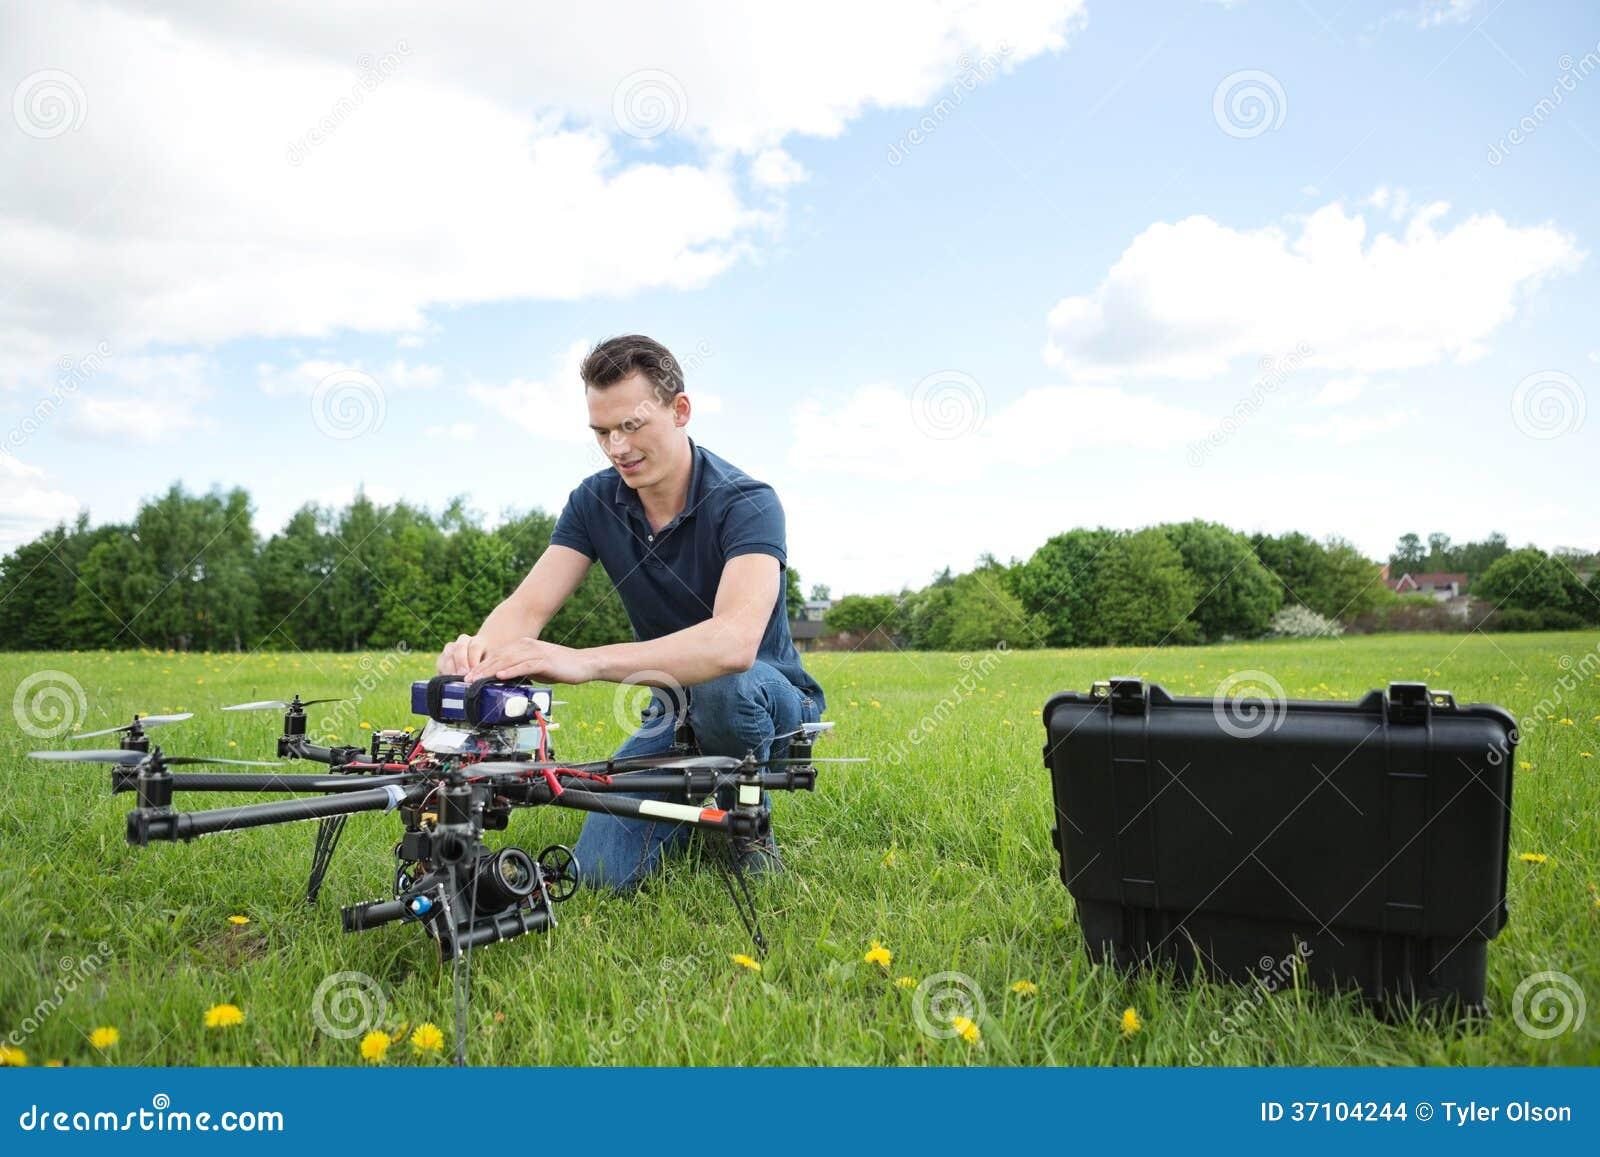 Engineer Fixing UAV Drone in Park